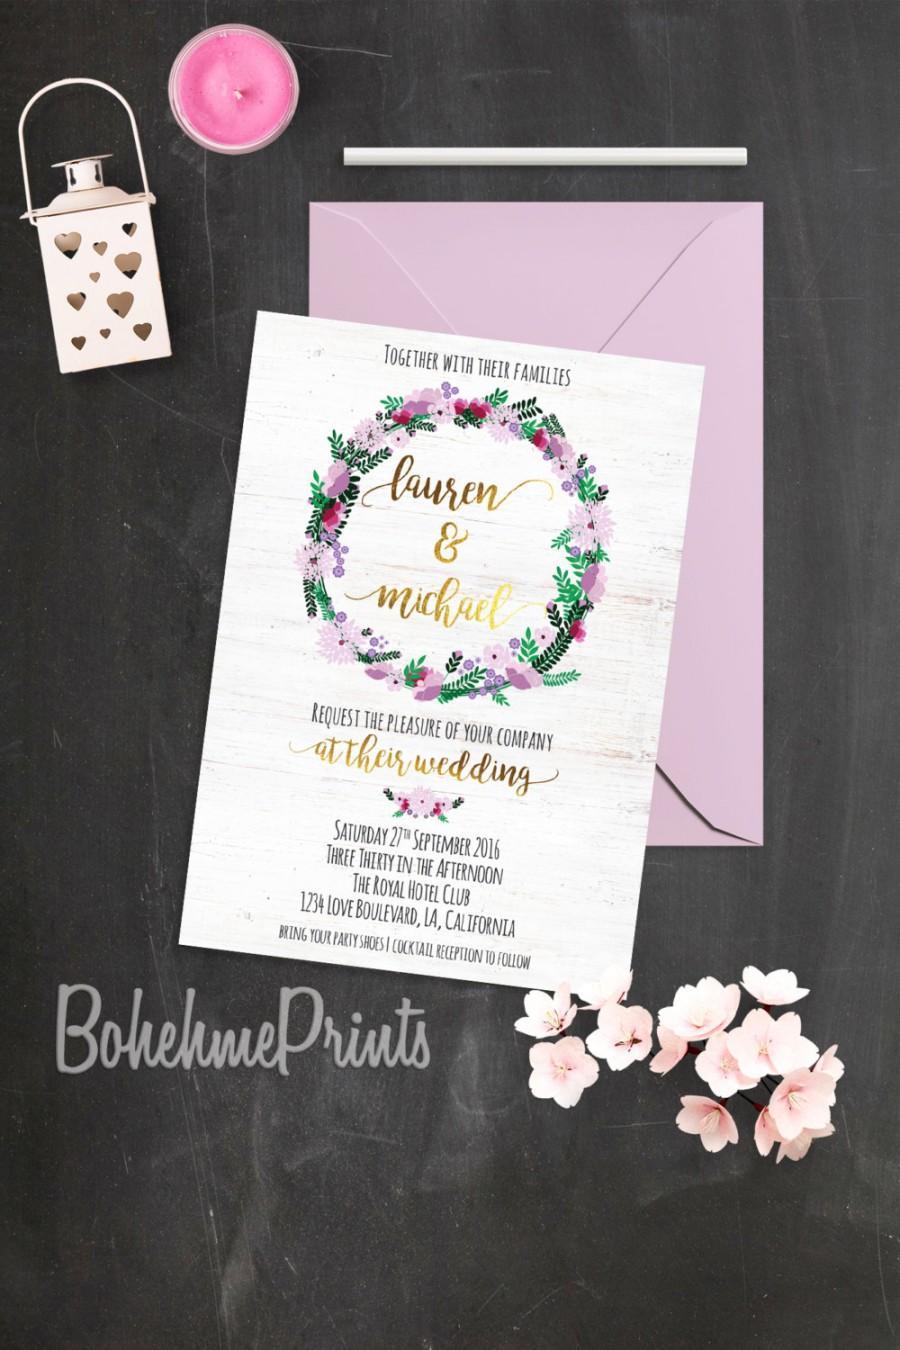 Mariage - Bohemian Wedding Invitation Boho Rustic Wedding Invitation Suite Customizable Wedding Invitation Floral Wreath Wedding Invitation Printable